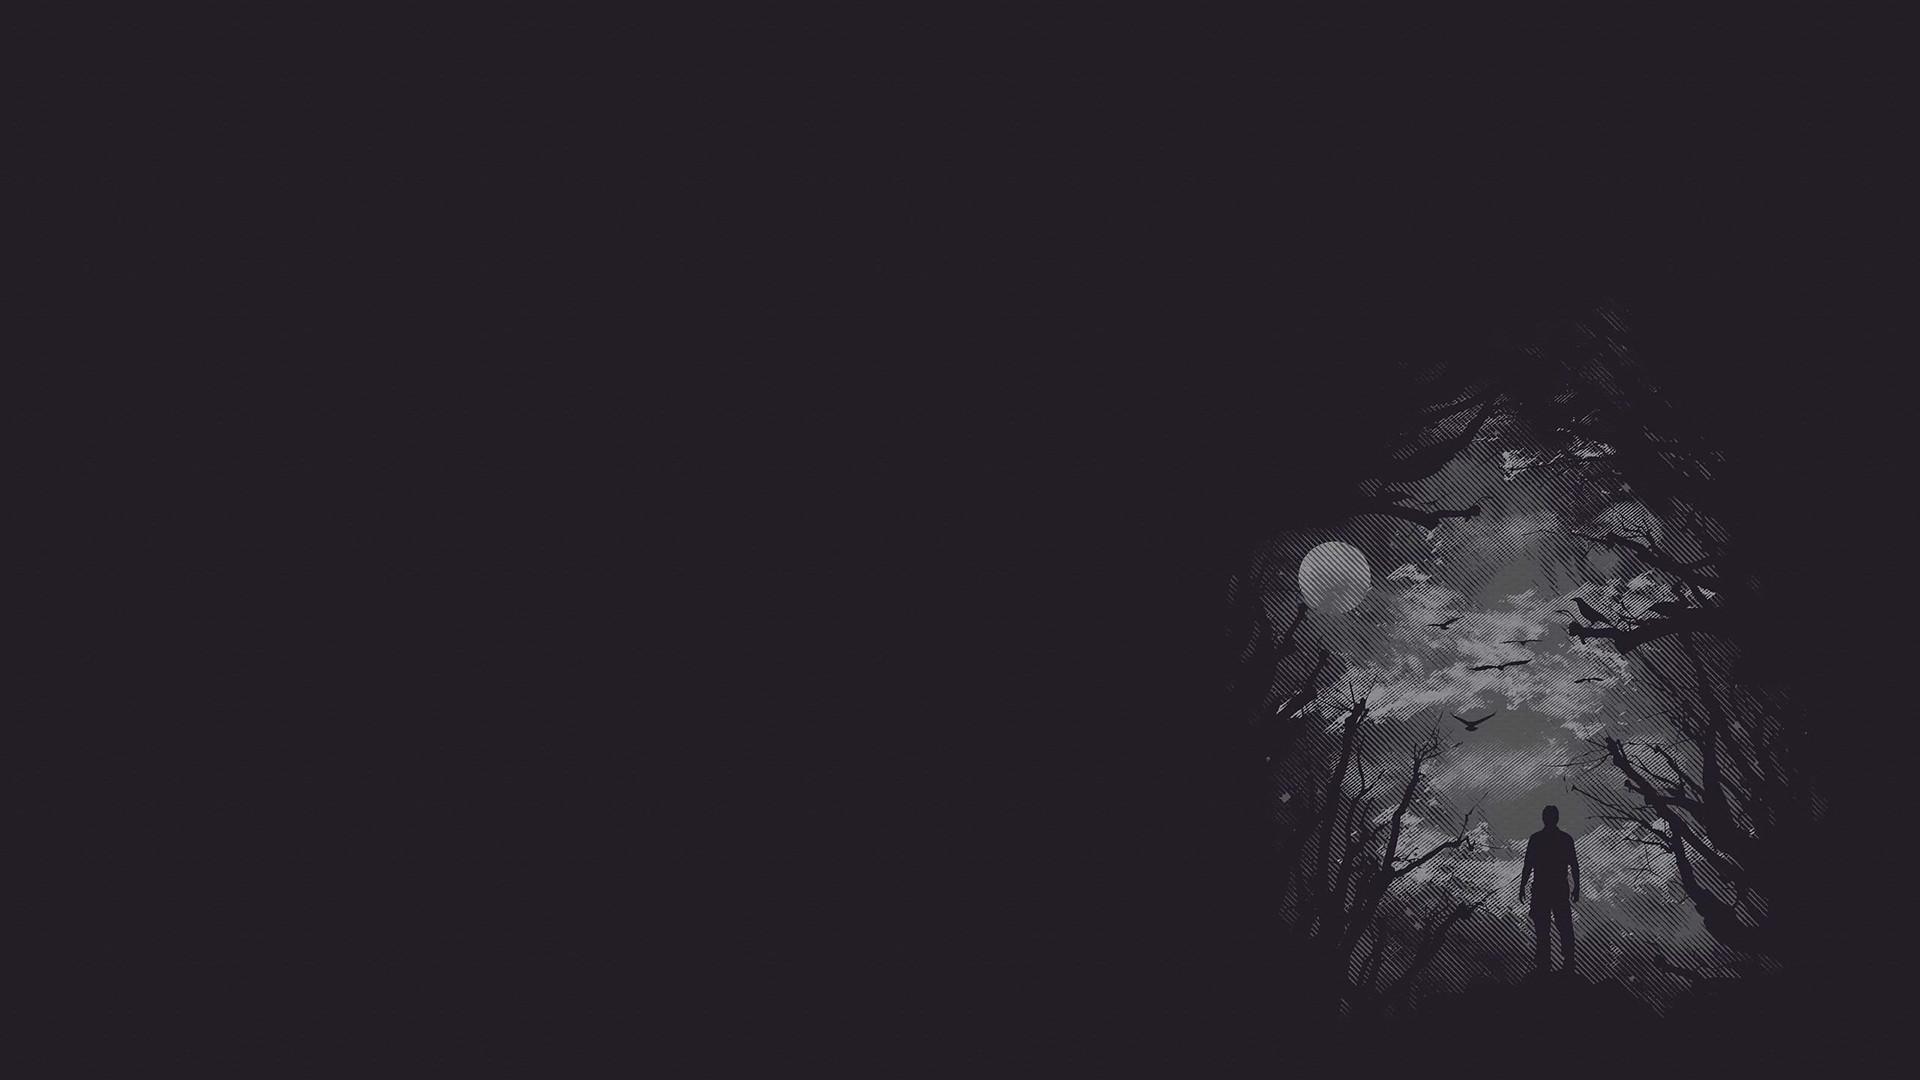 Dark Vector Men Males Trees Forest Creepy Wallpaper At Dark Wallpapers